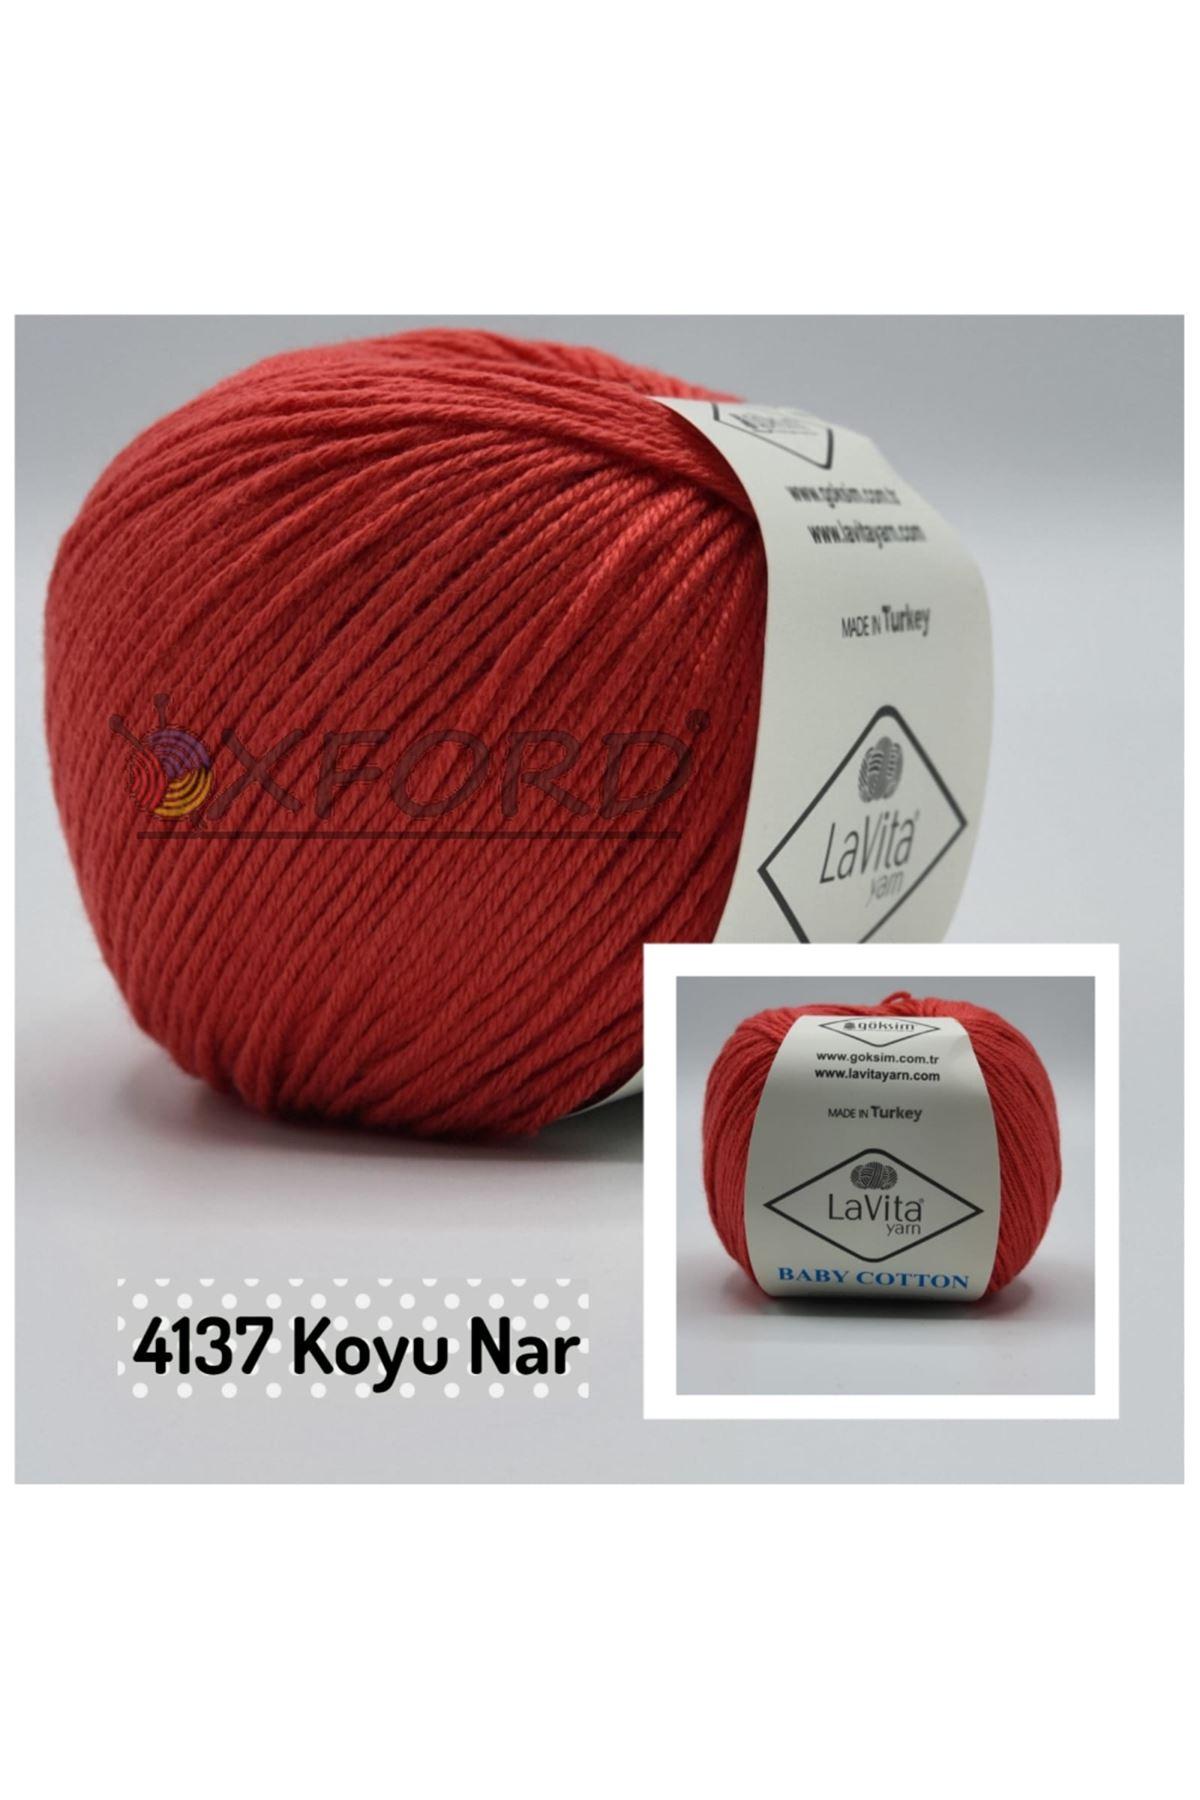 Lavita Baby Cotton 4137 Koyu Nar